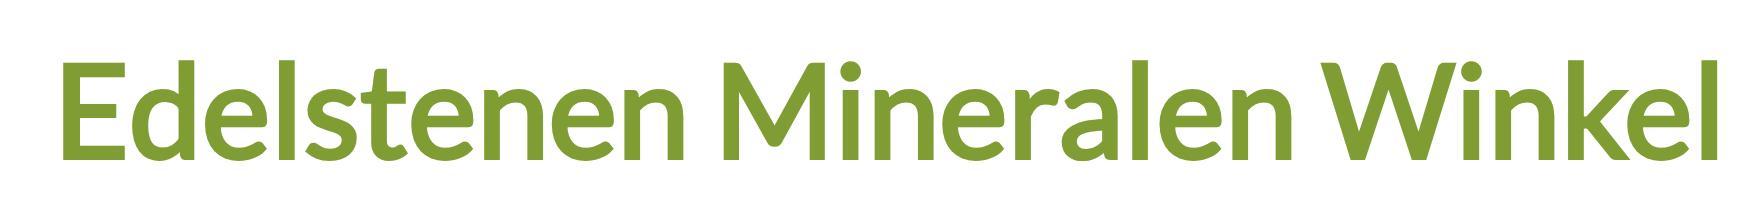 edelstenen mineralen amethist ammoniet, edelstenenmineralenwinkel.nl